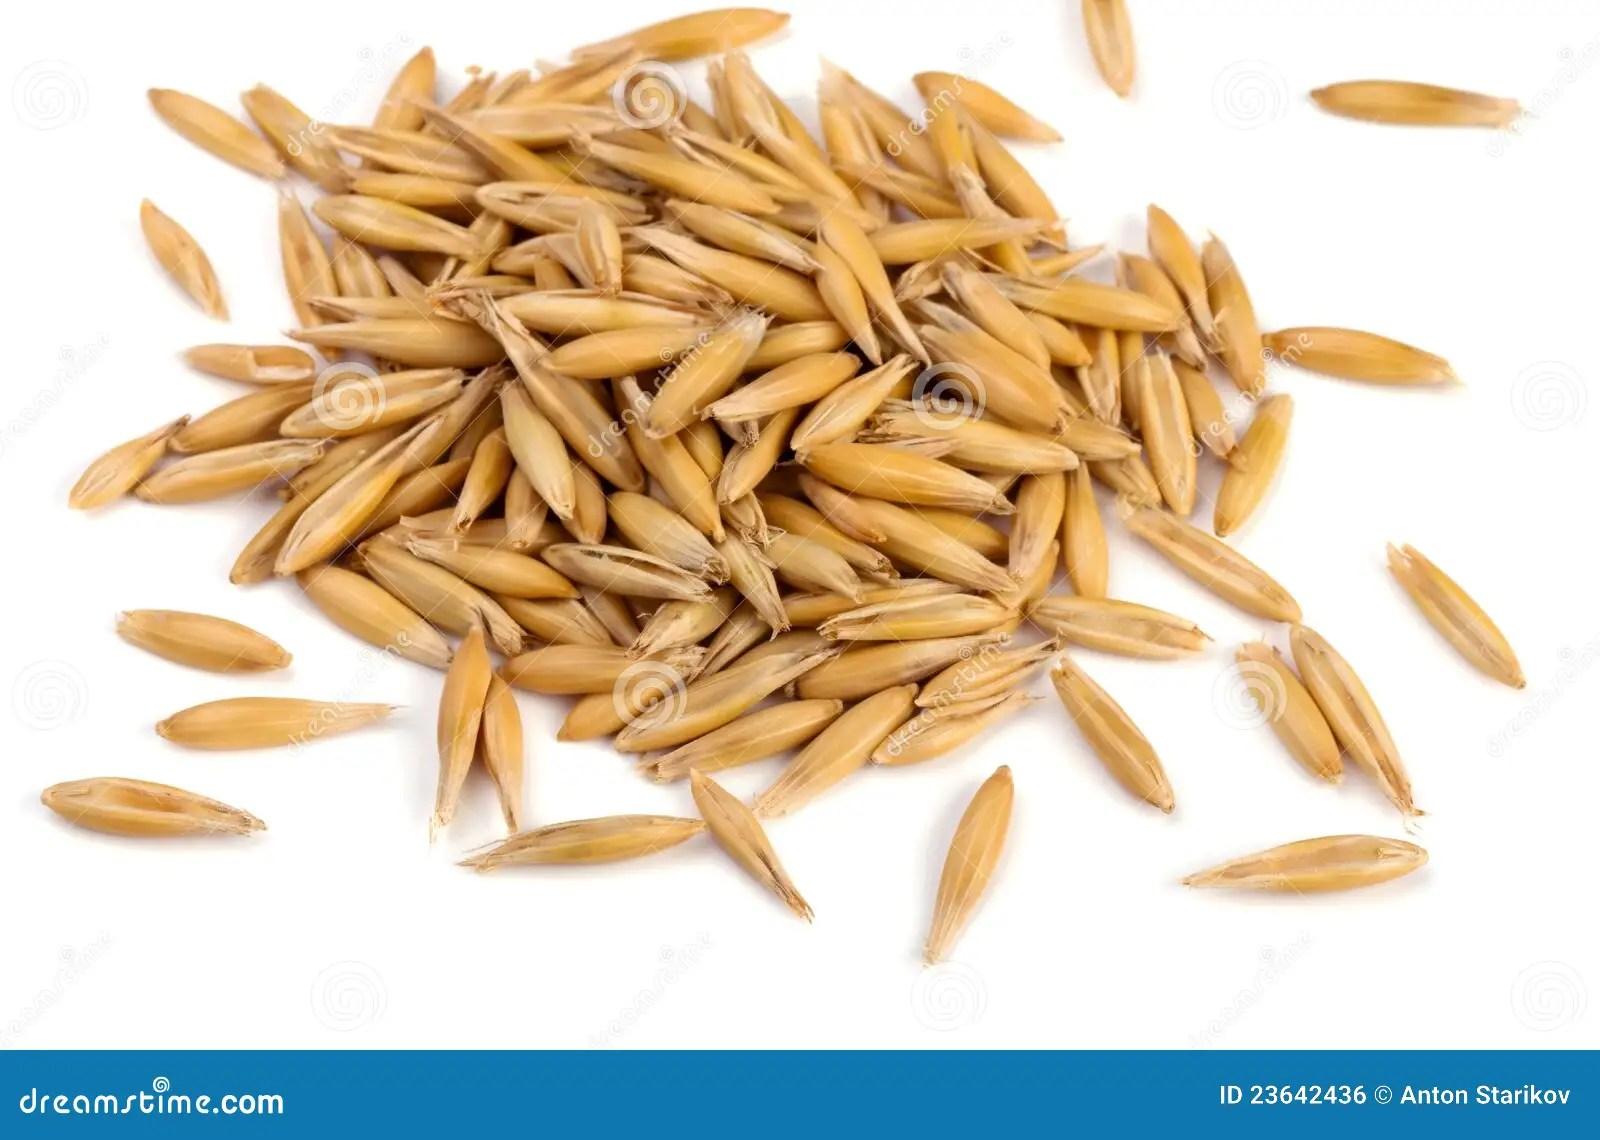 hight resolution of oat grains